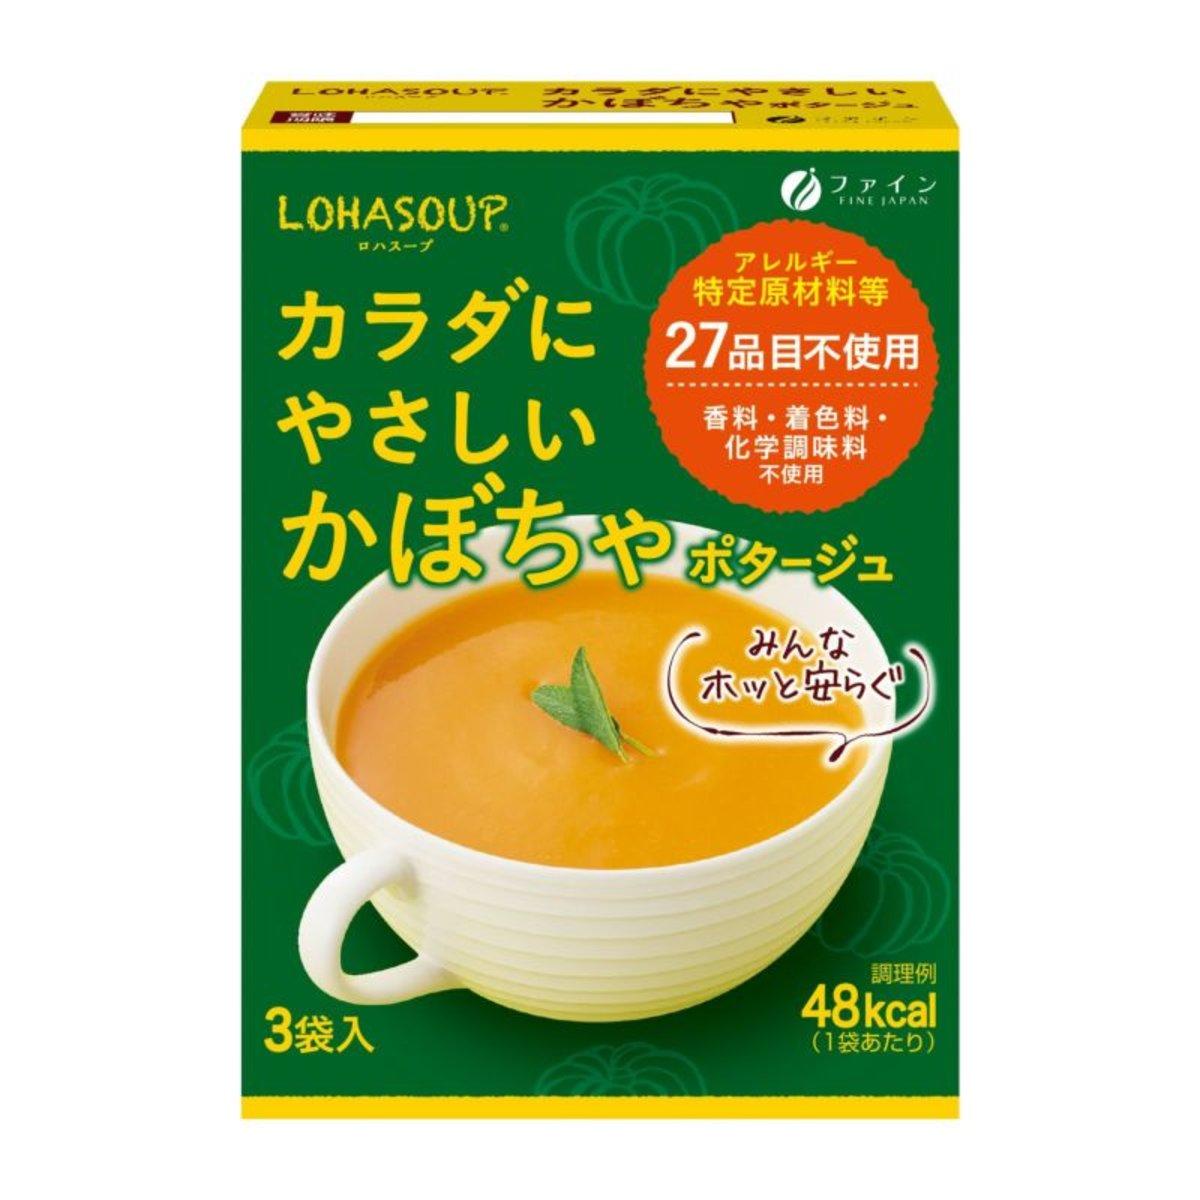 FINE Japanese Pumpkin Potage 42g (14gx3packs)(007291)